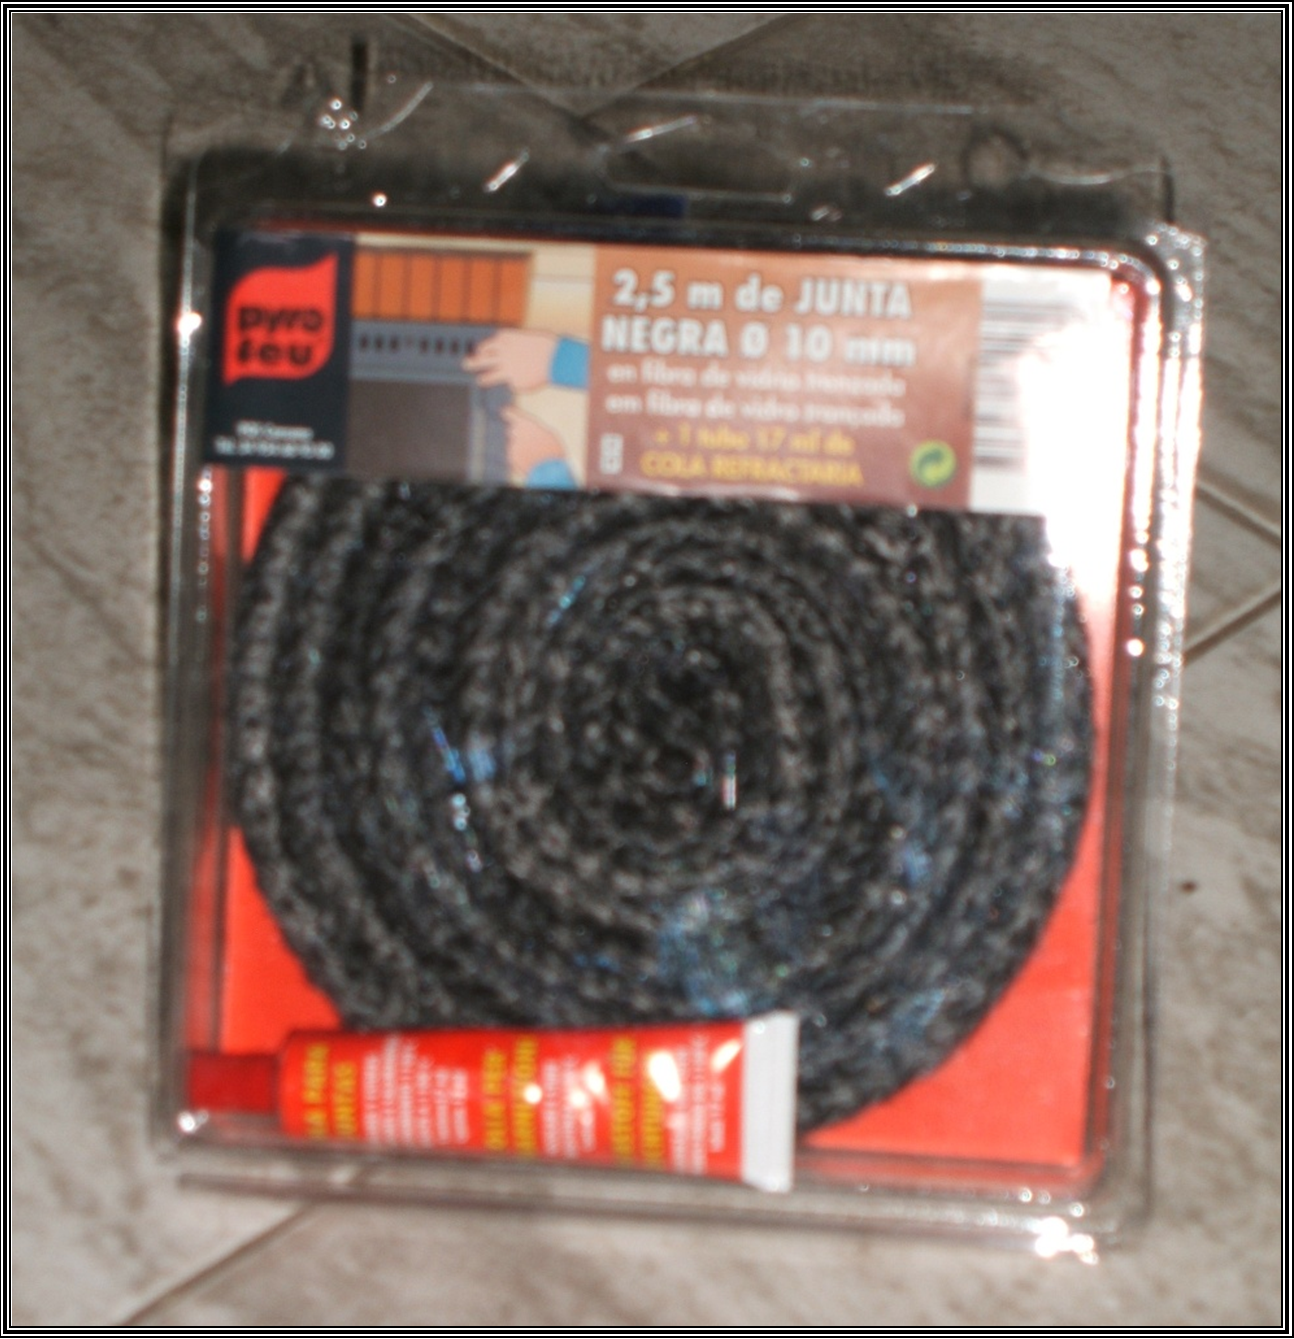 Chimeneas sierra cord n para juntas de fibra de vidrio - Puertas de vidrio para chimeneas ...